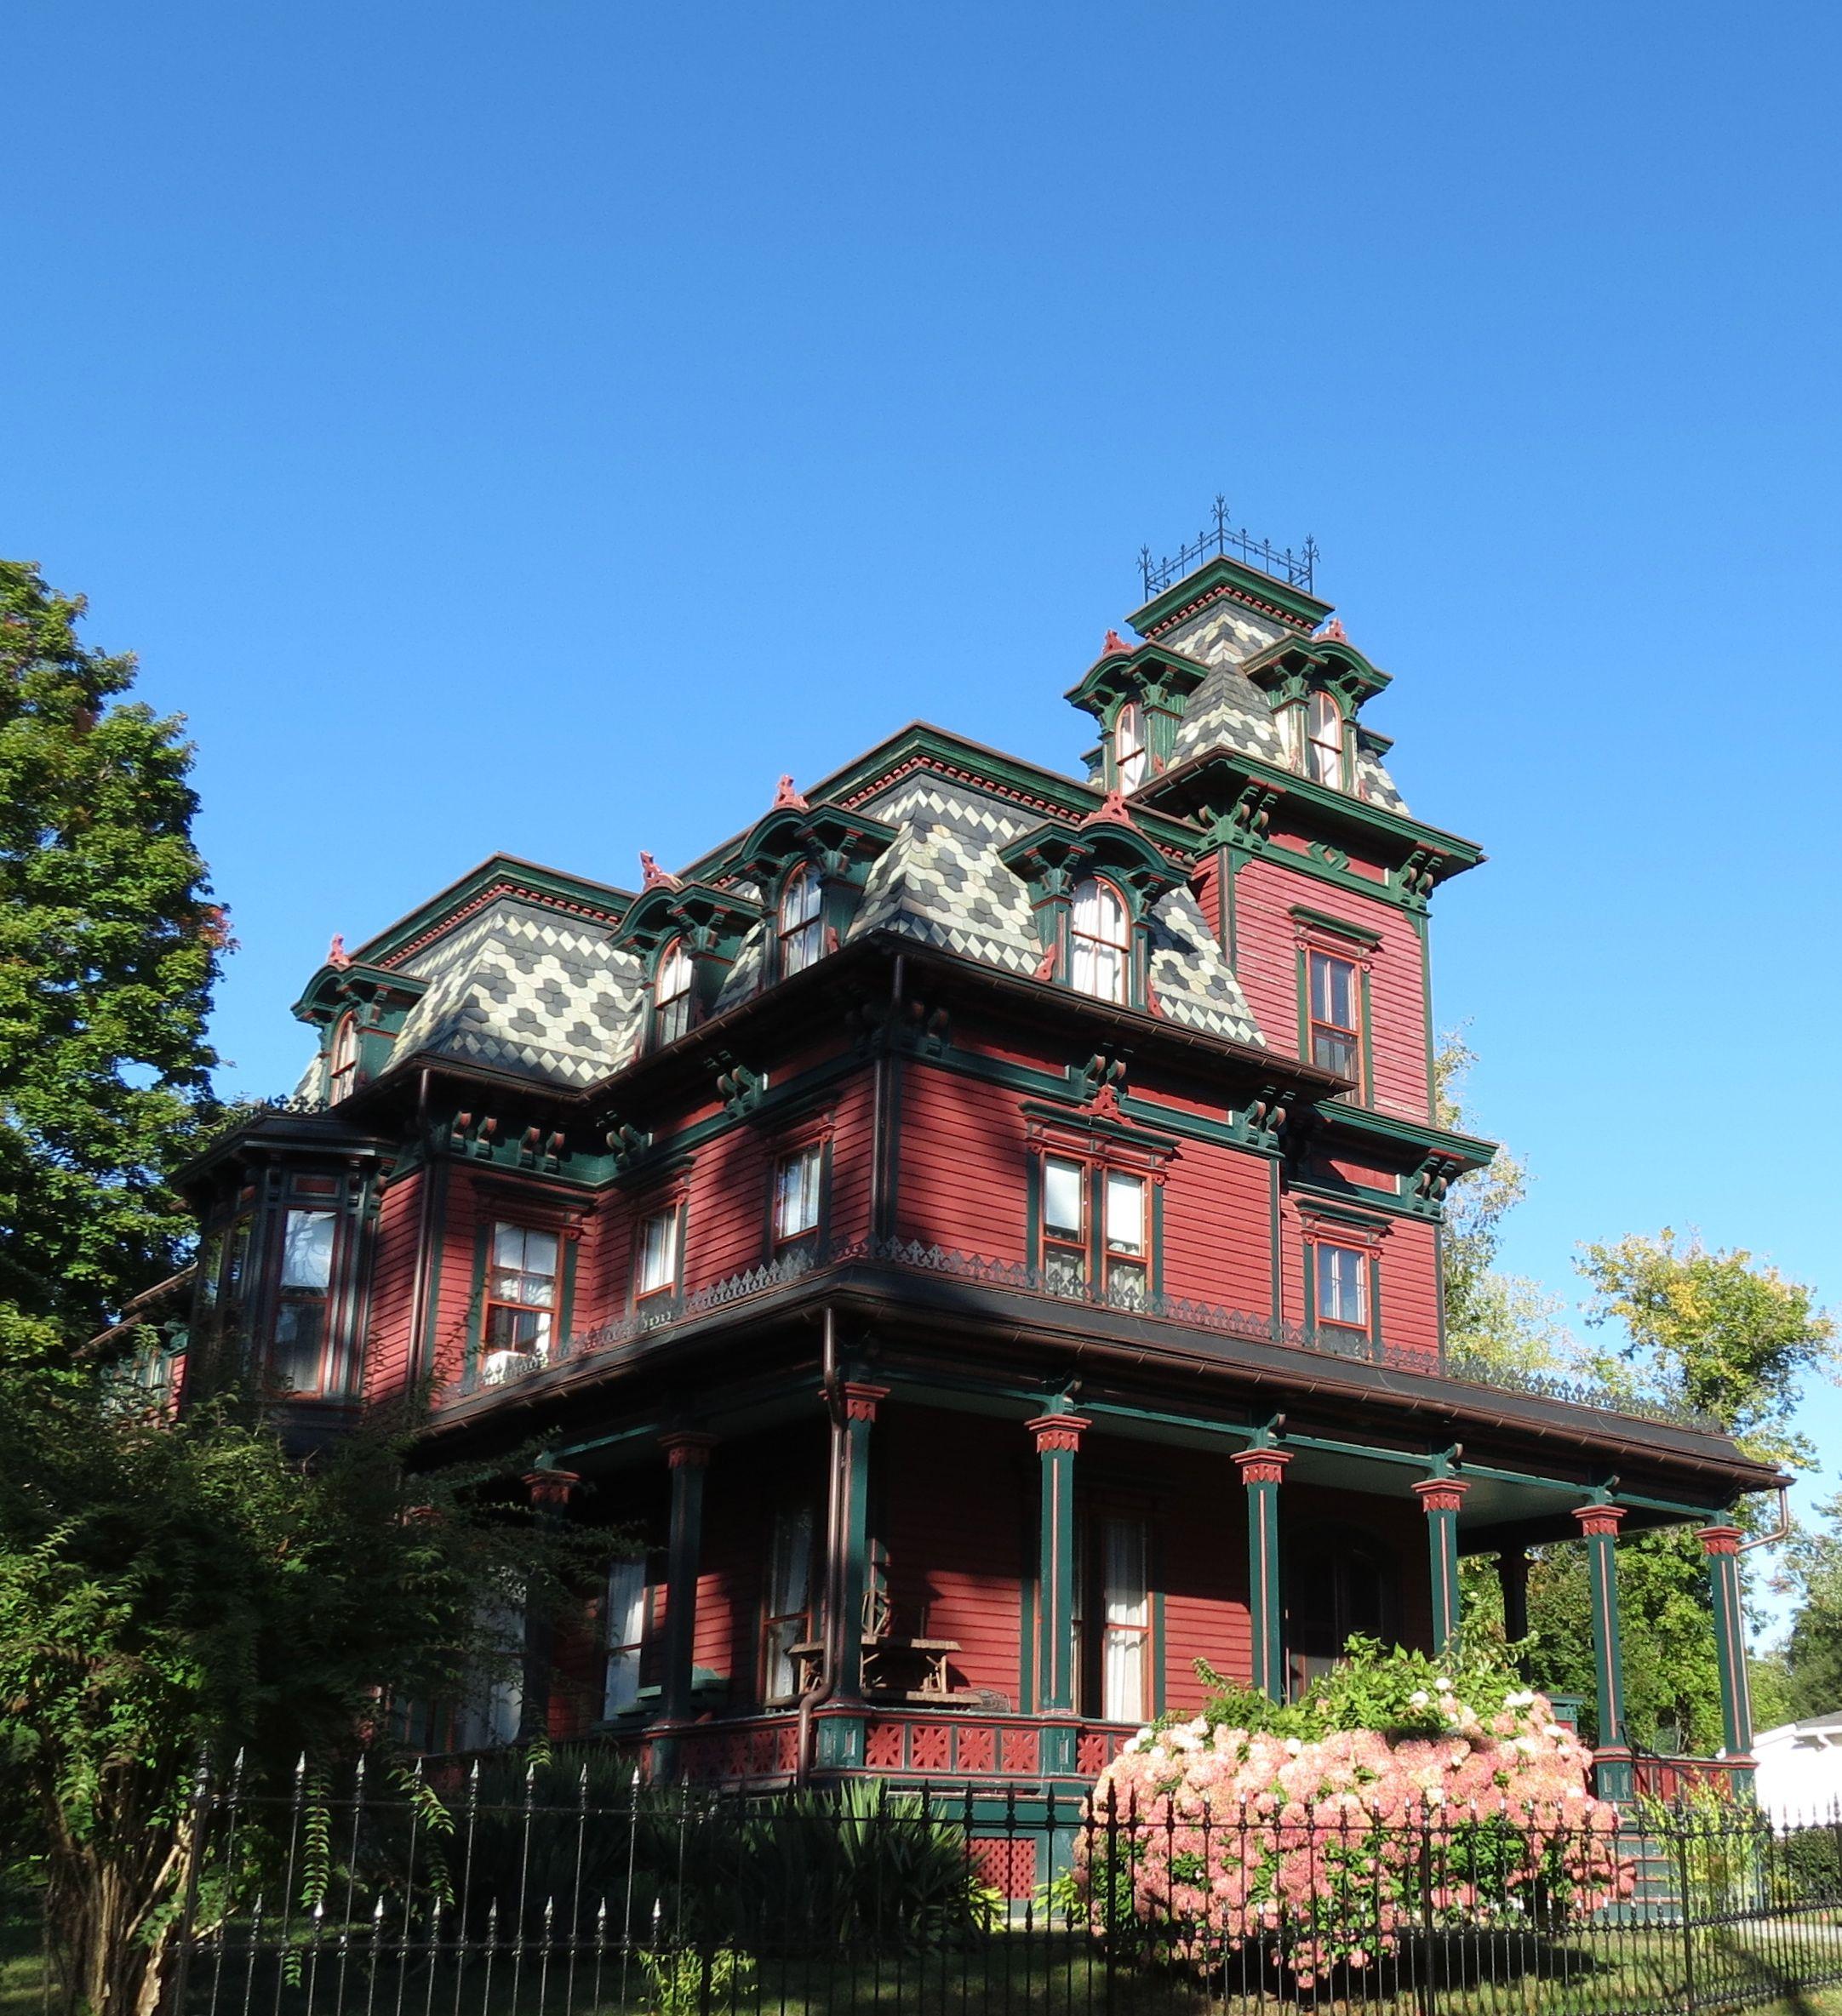 Pleasant Street, Monson, Massachusetts. What a beauty! Love the roof detail.